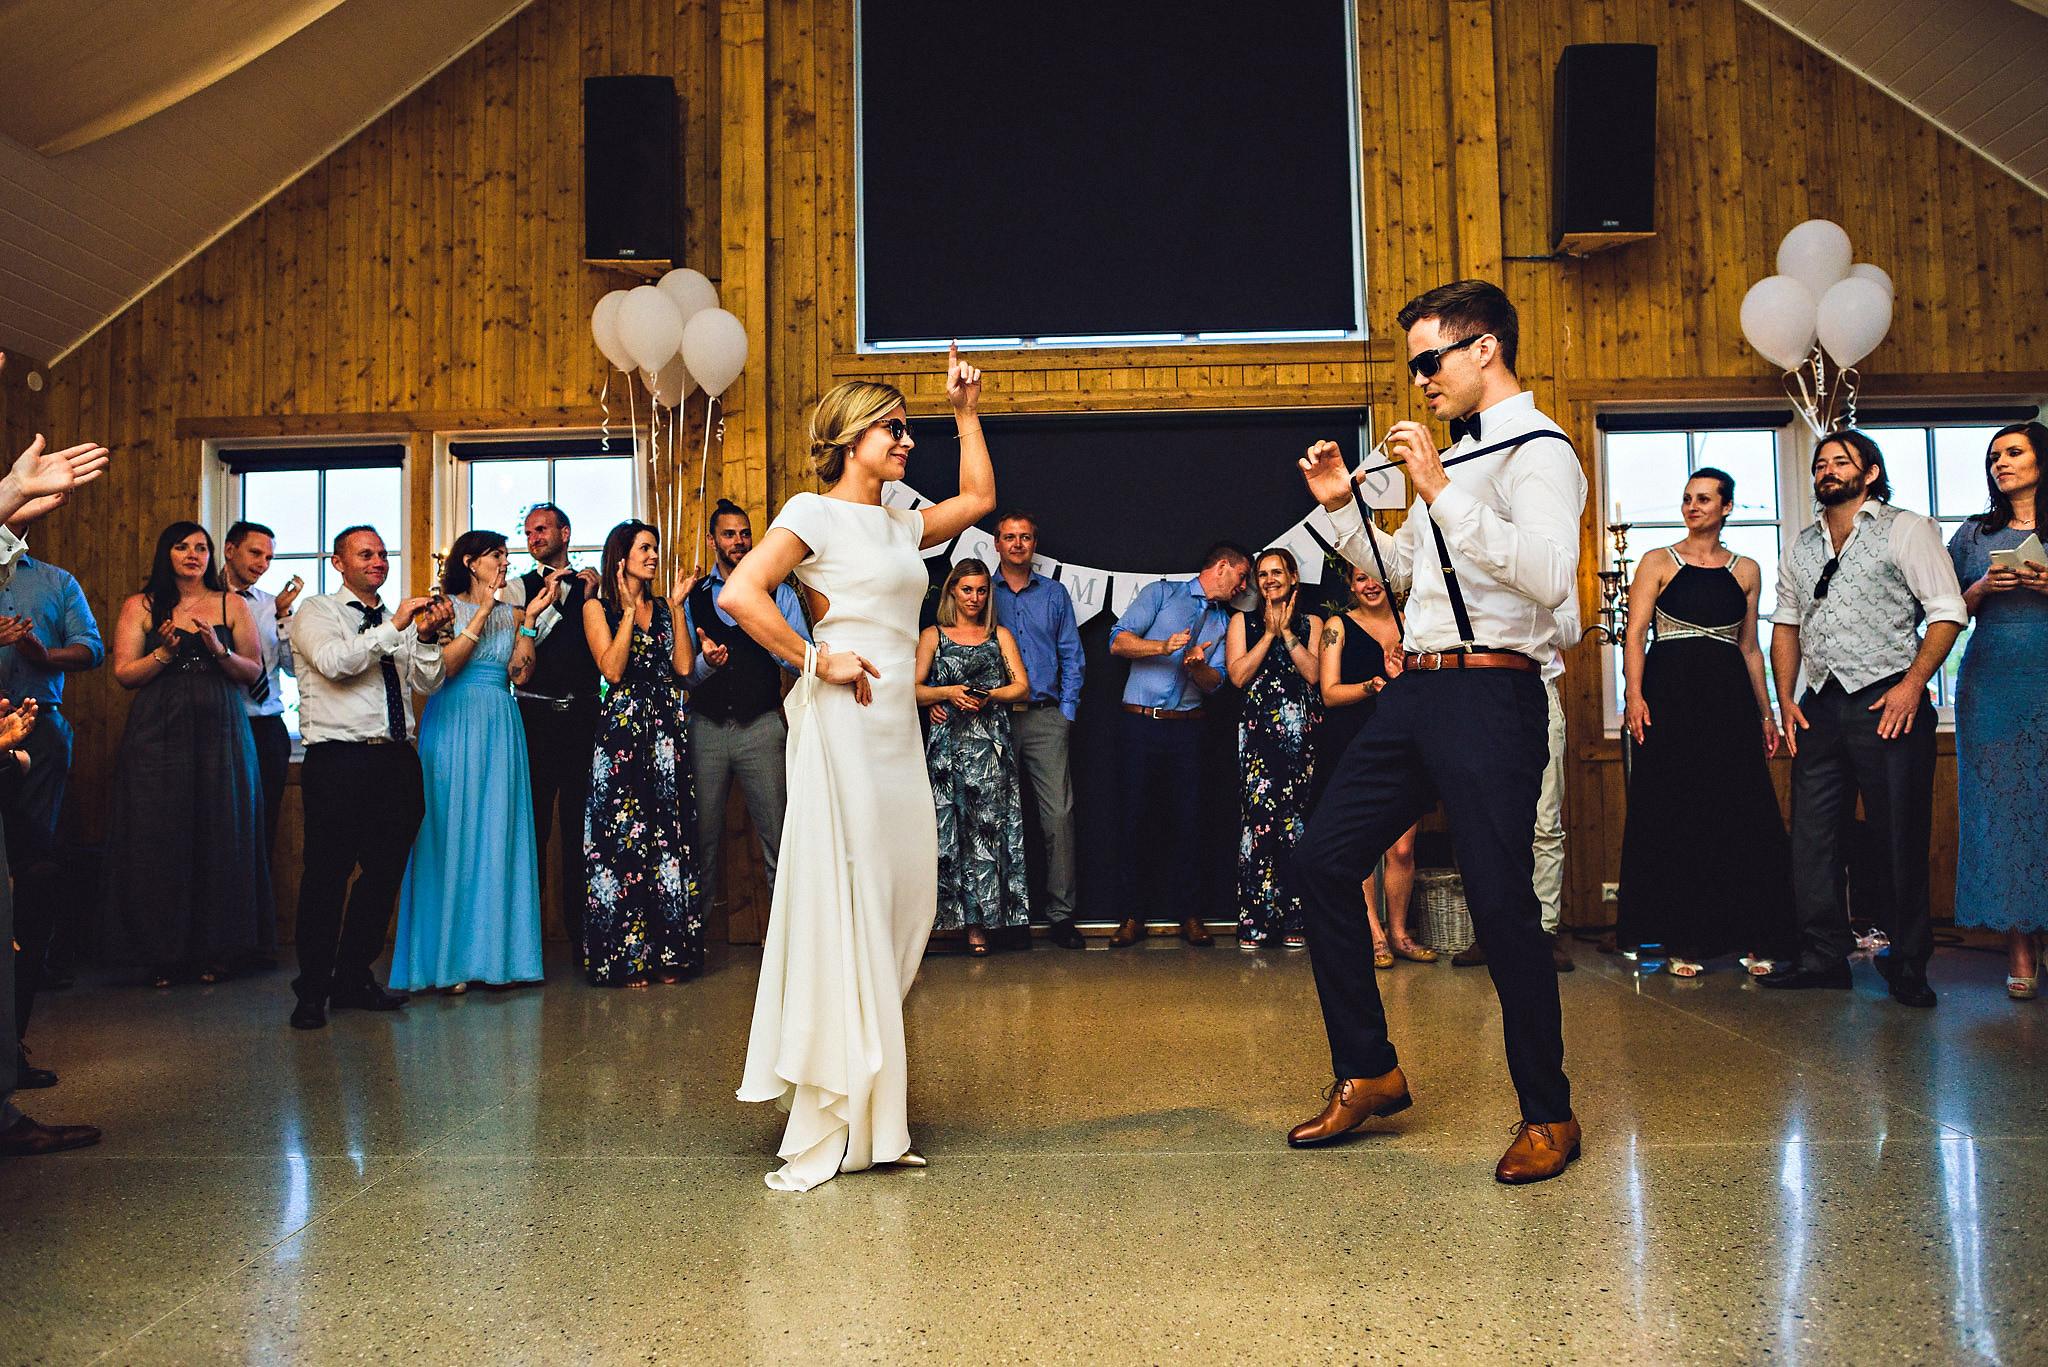 Bryllup på Solastranden Gård fotograf Eirik Halvorsen-24.jpg